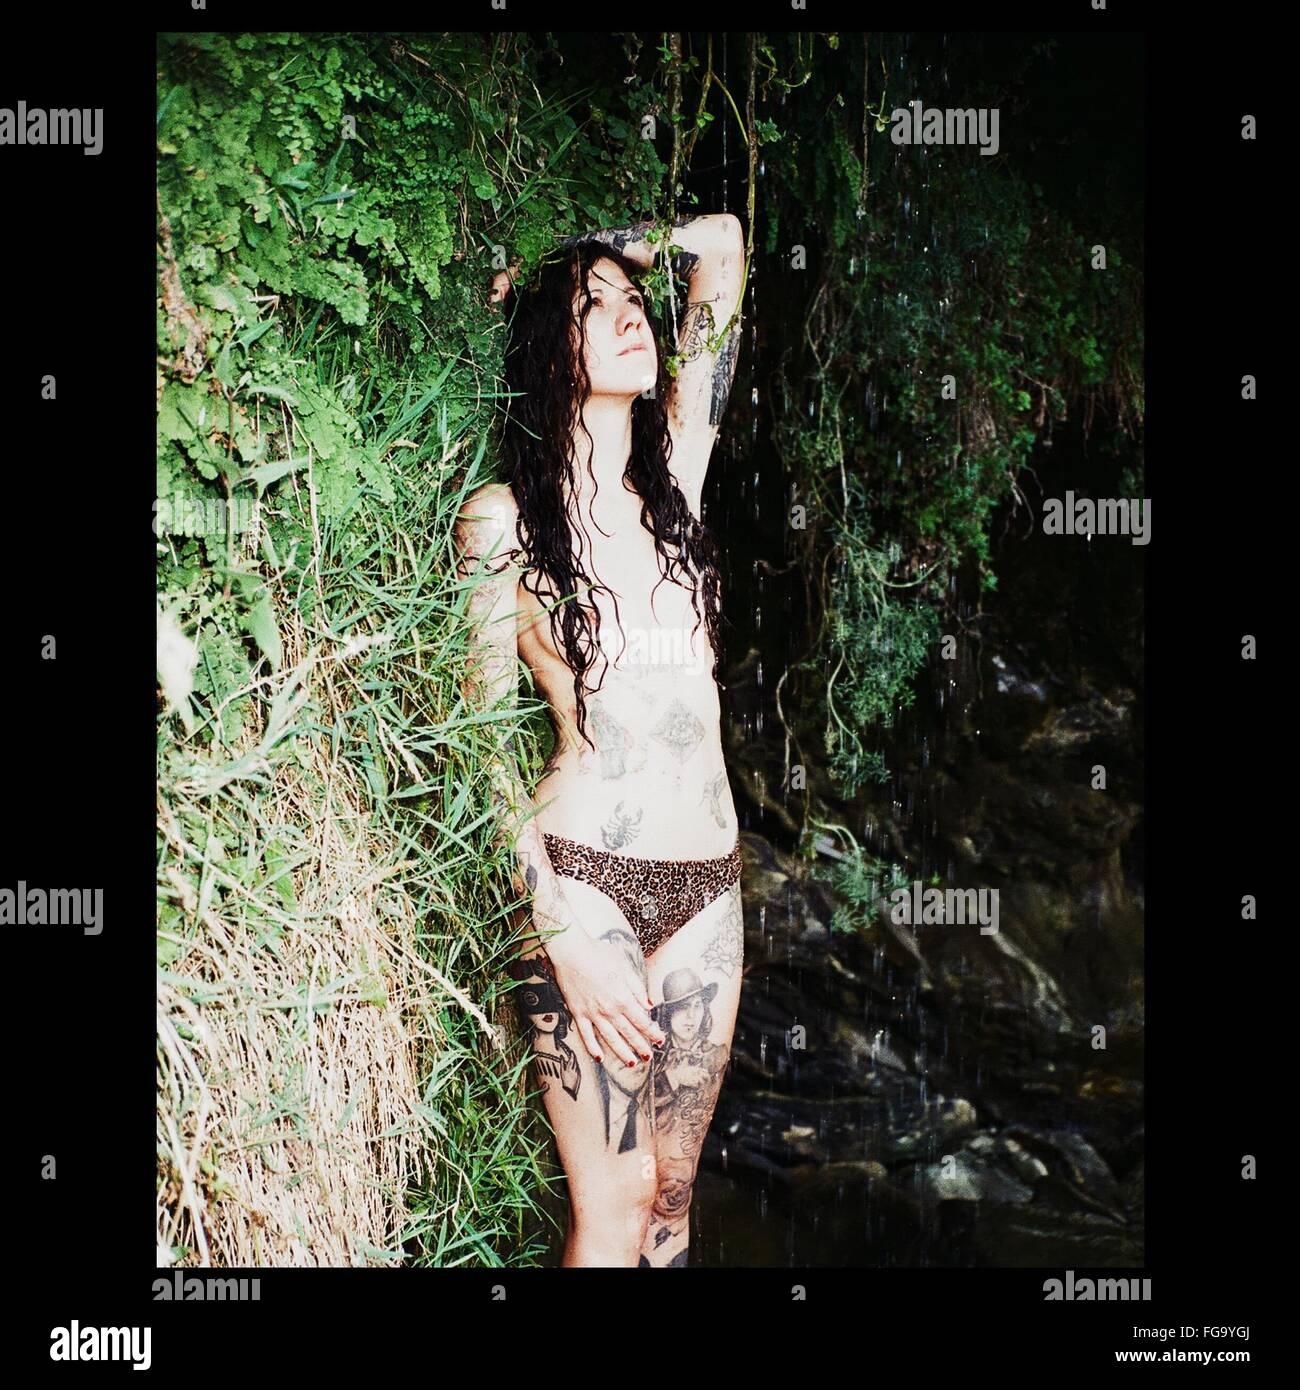 Tattooed Woman In Bikini Bottom Standing In Cave On Rainy Day - Stock Image